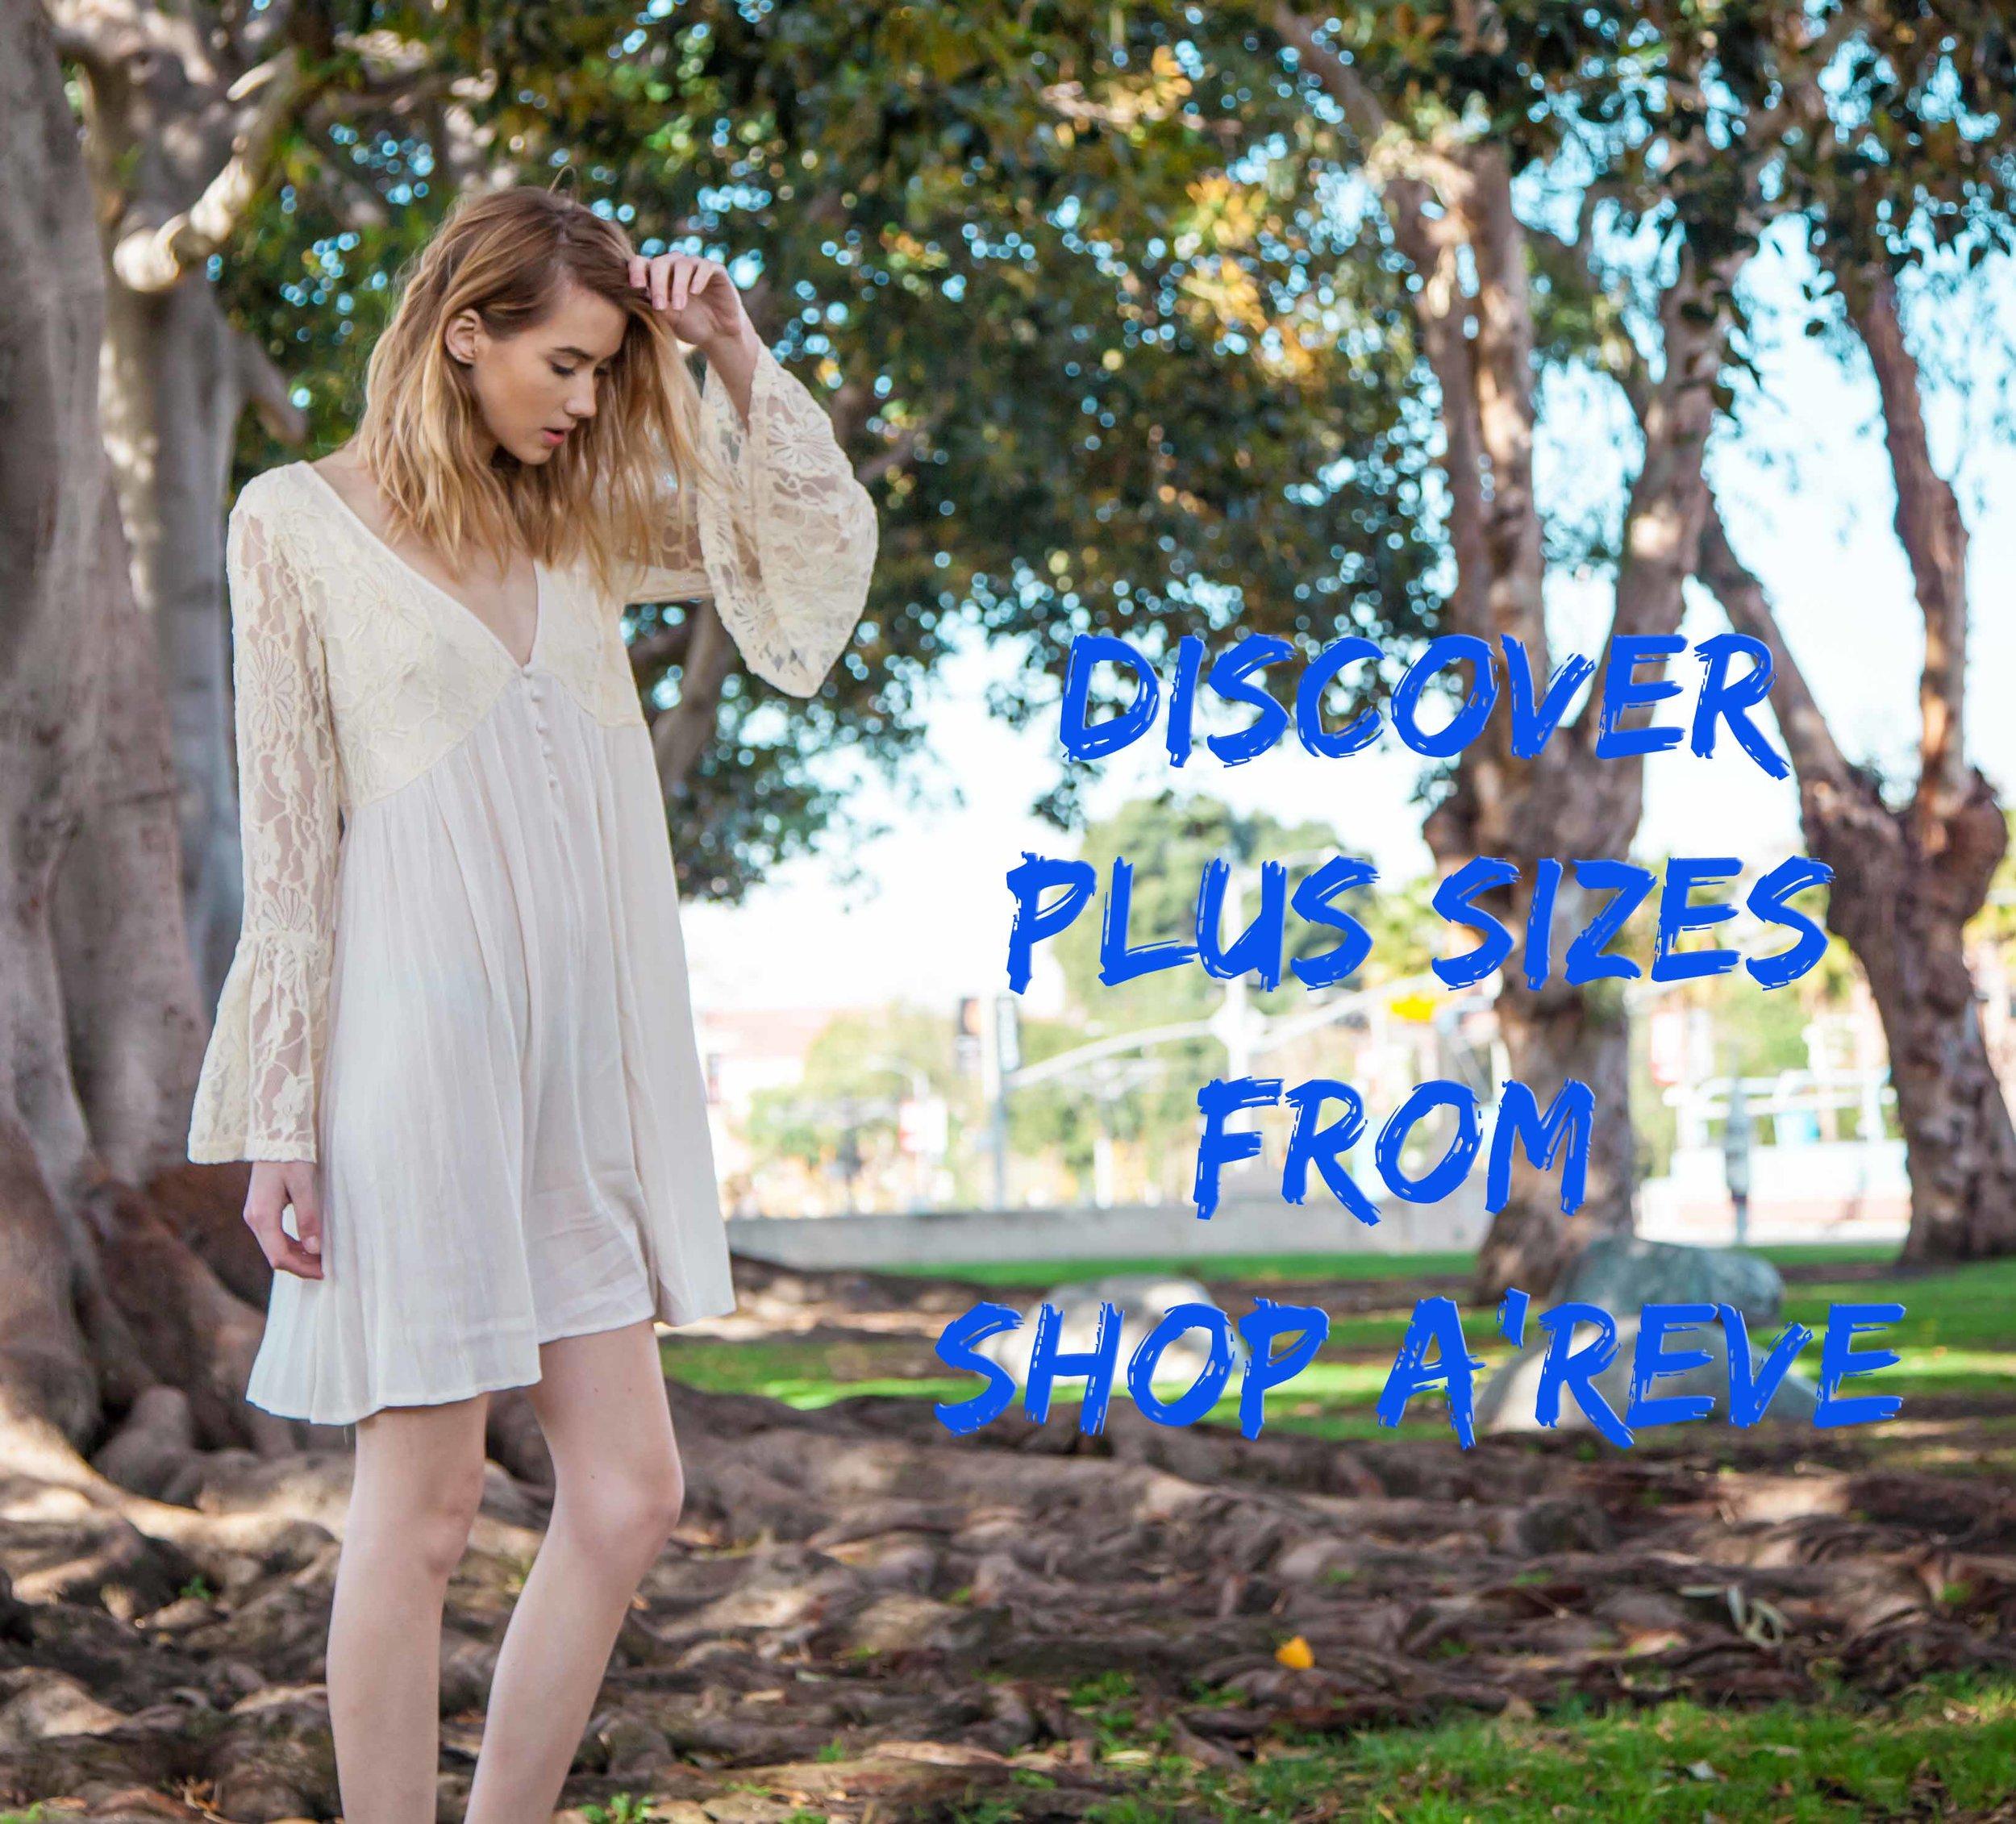 shop areve plus size ad.jpg